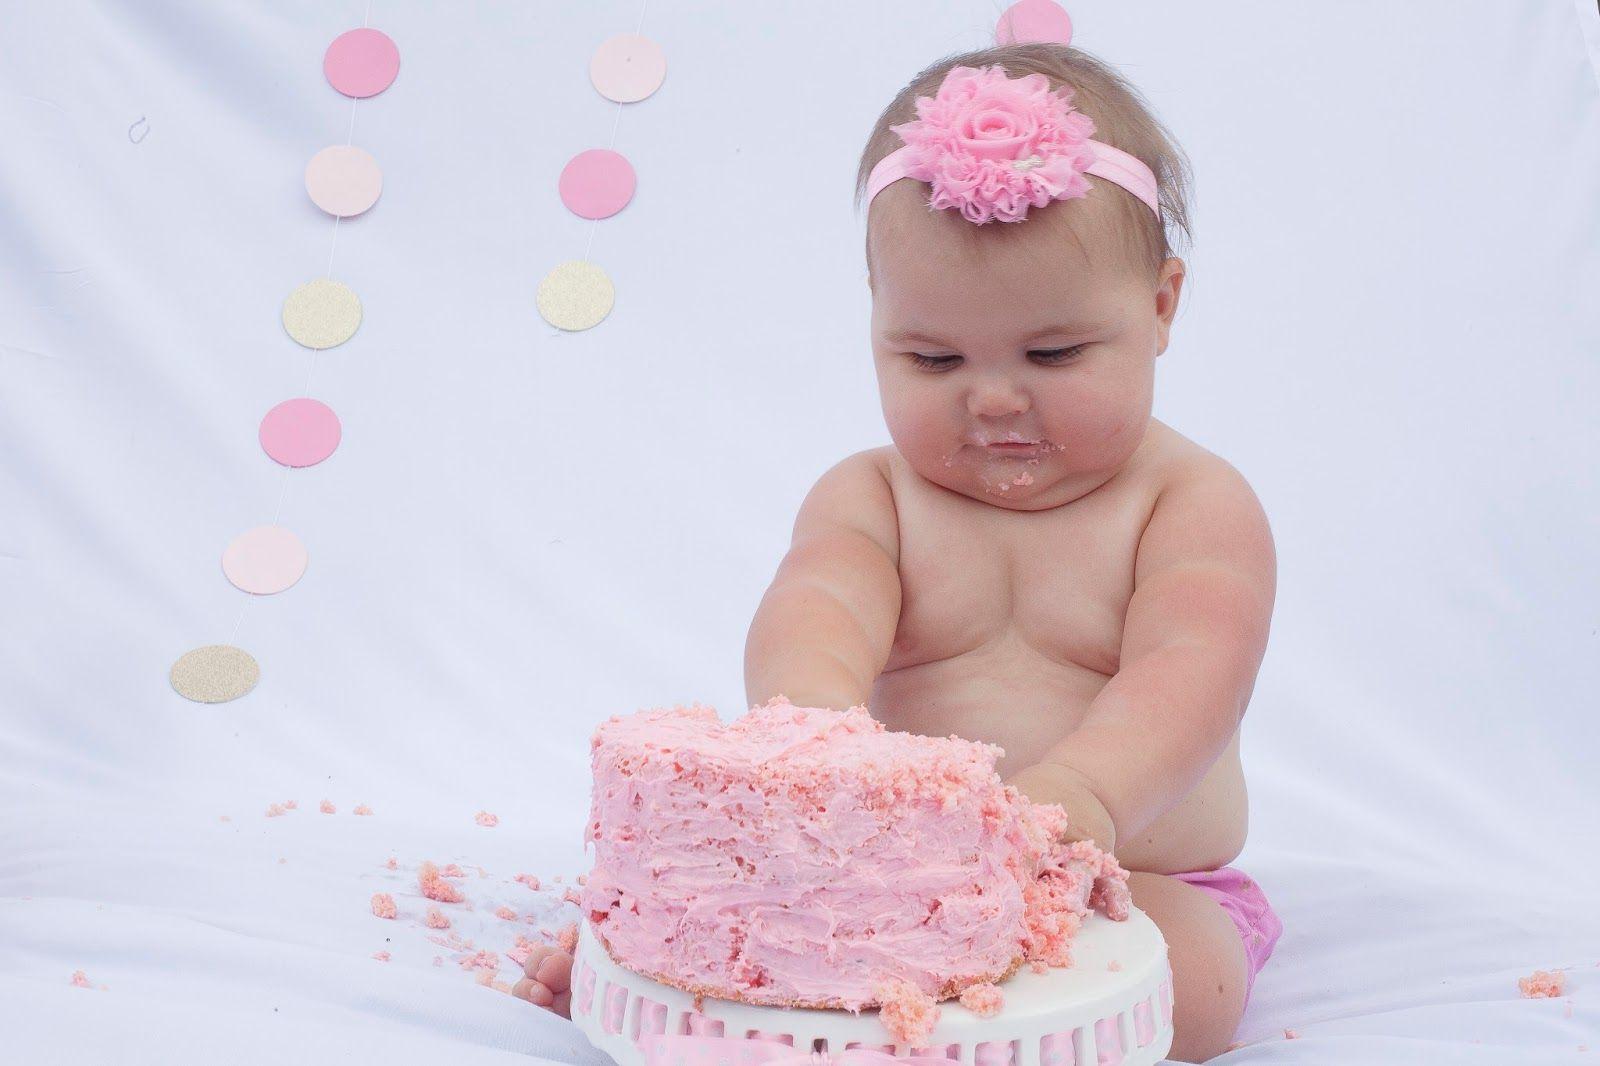 Laura H Garrett Photography: Lucy & Eloise Cake Smash